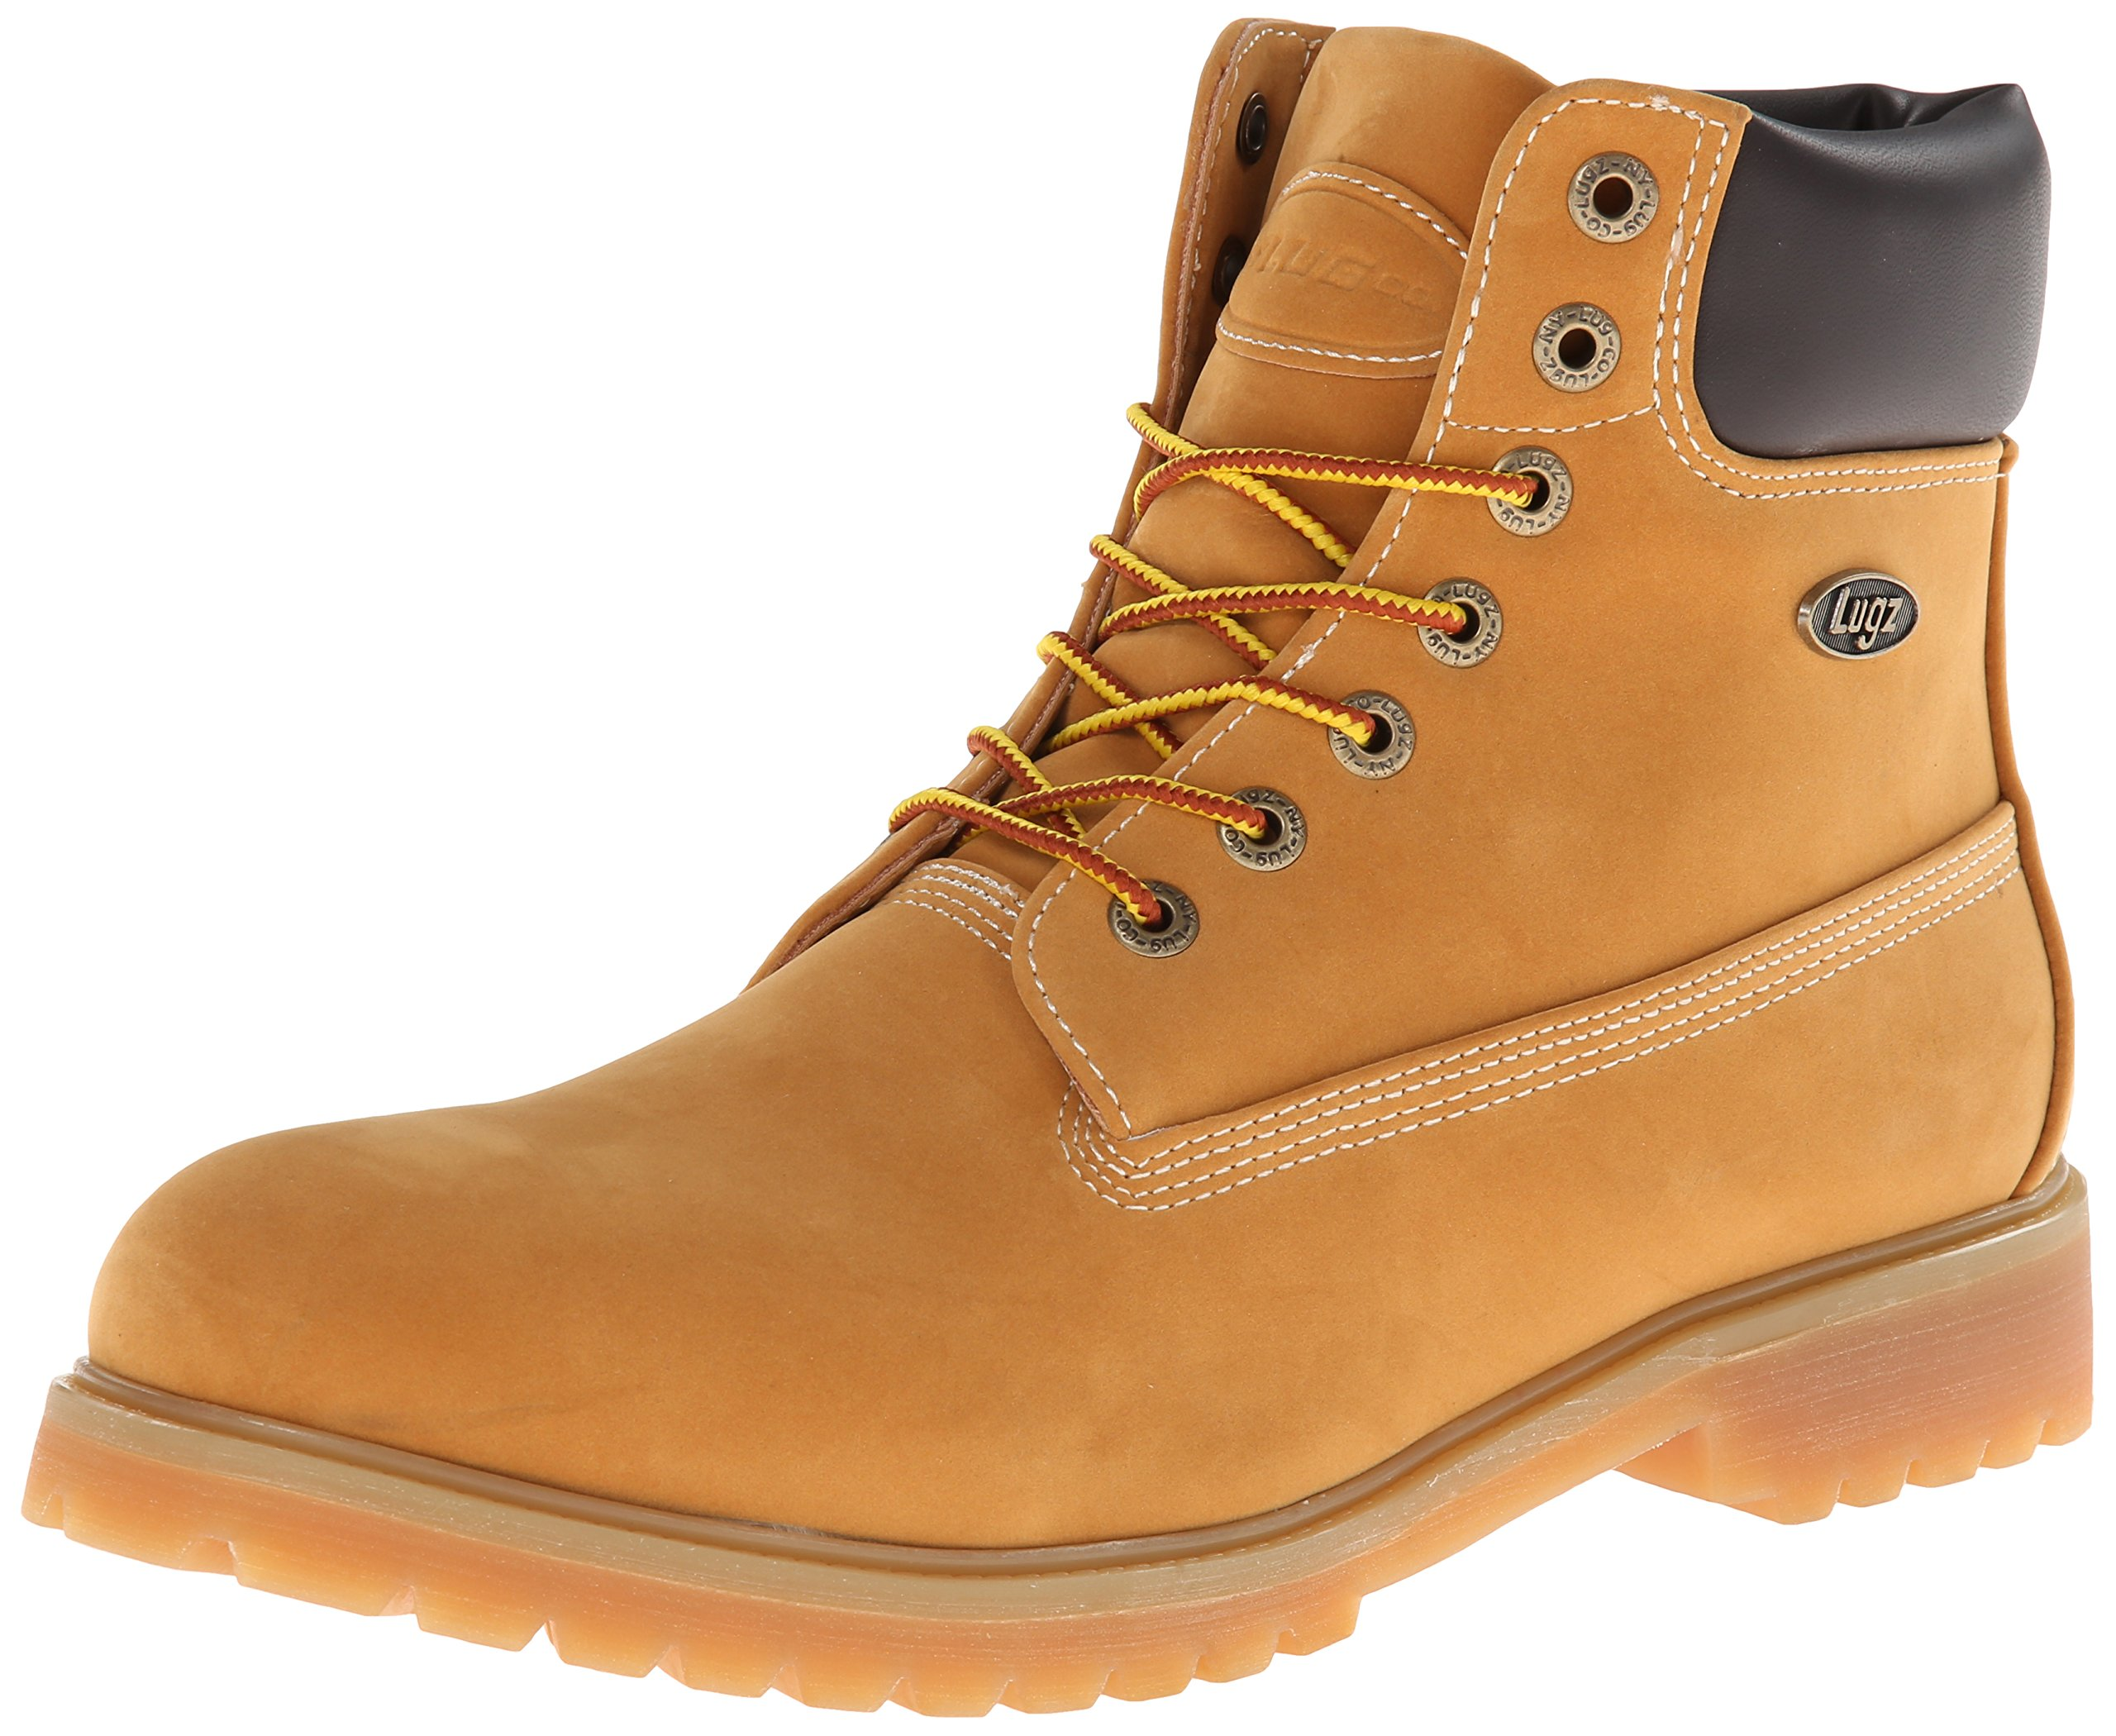 Lugz Men's Convoy Wr Winter Boot, Golden Wheat/Bark/Tan/Gum, 10.5 D US